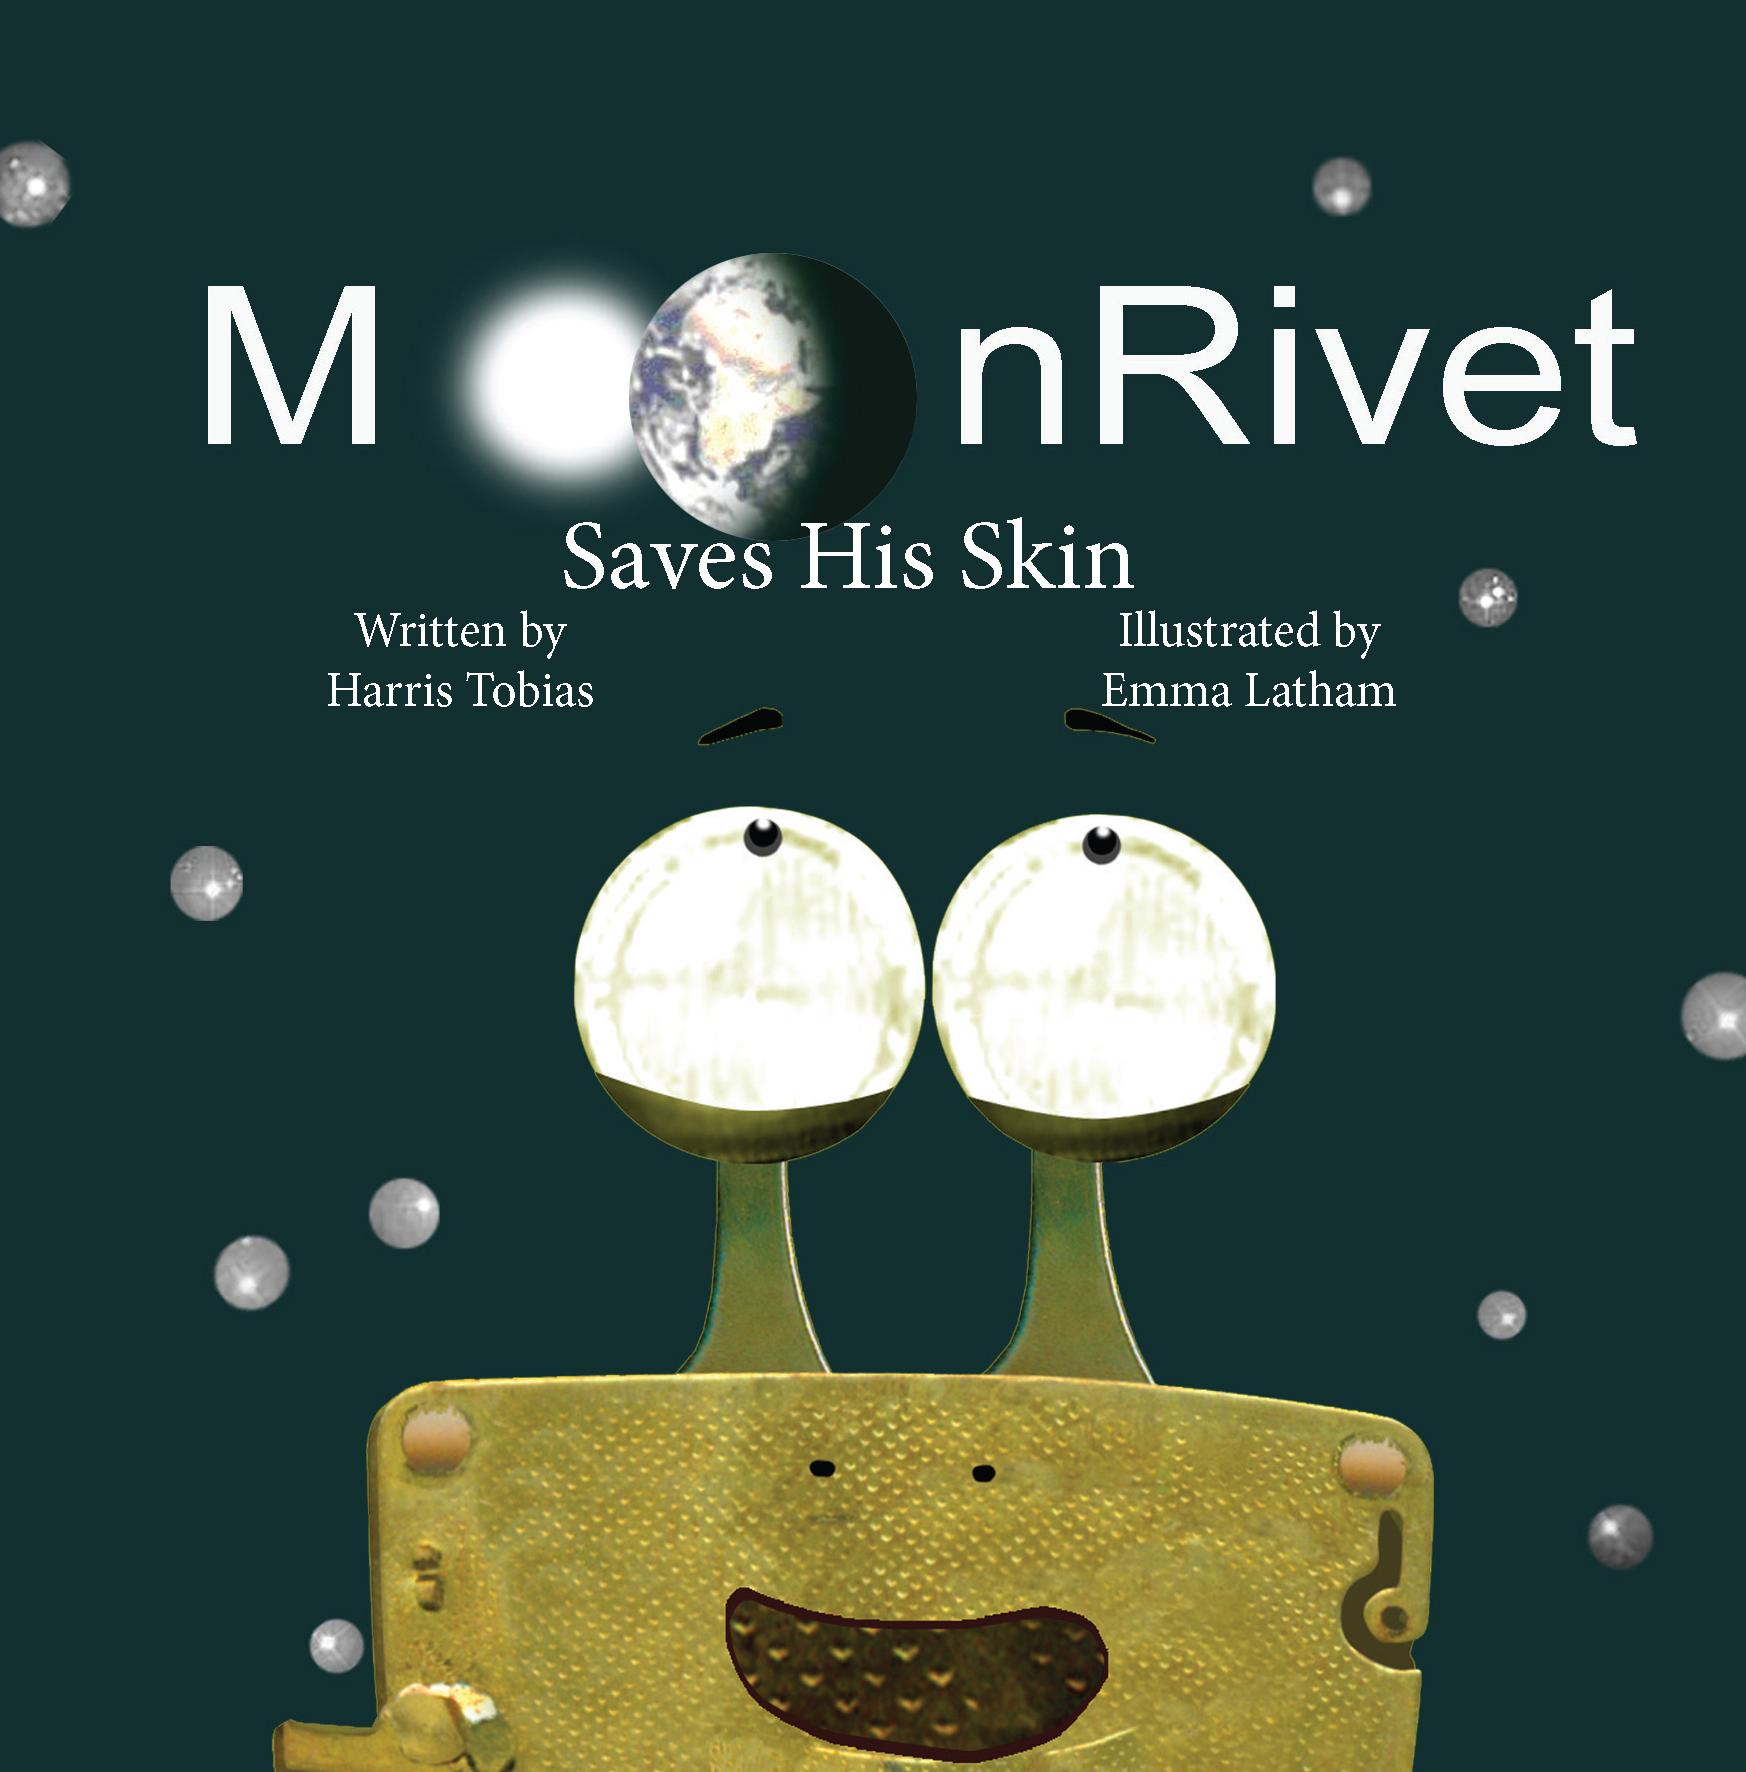 MoonRivet Saves His Skin